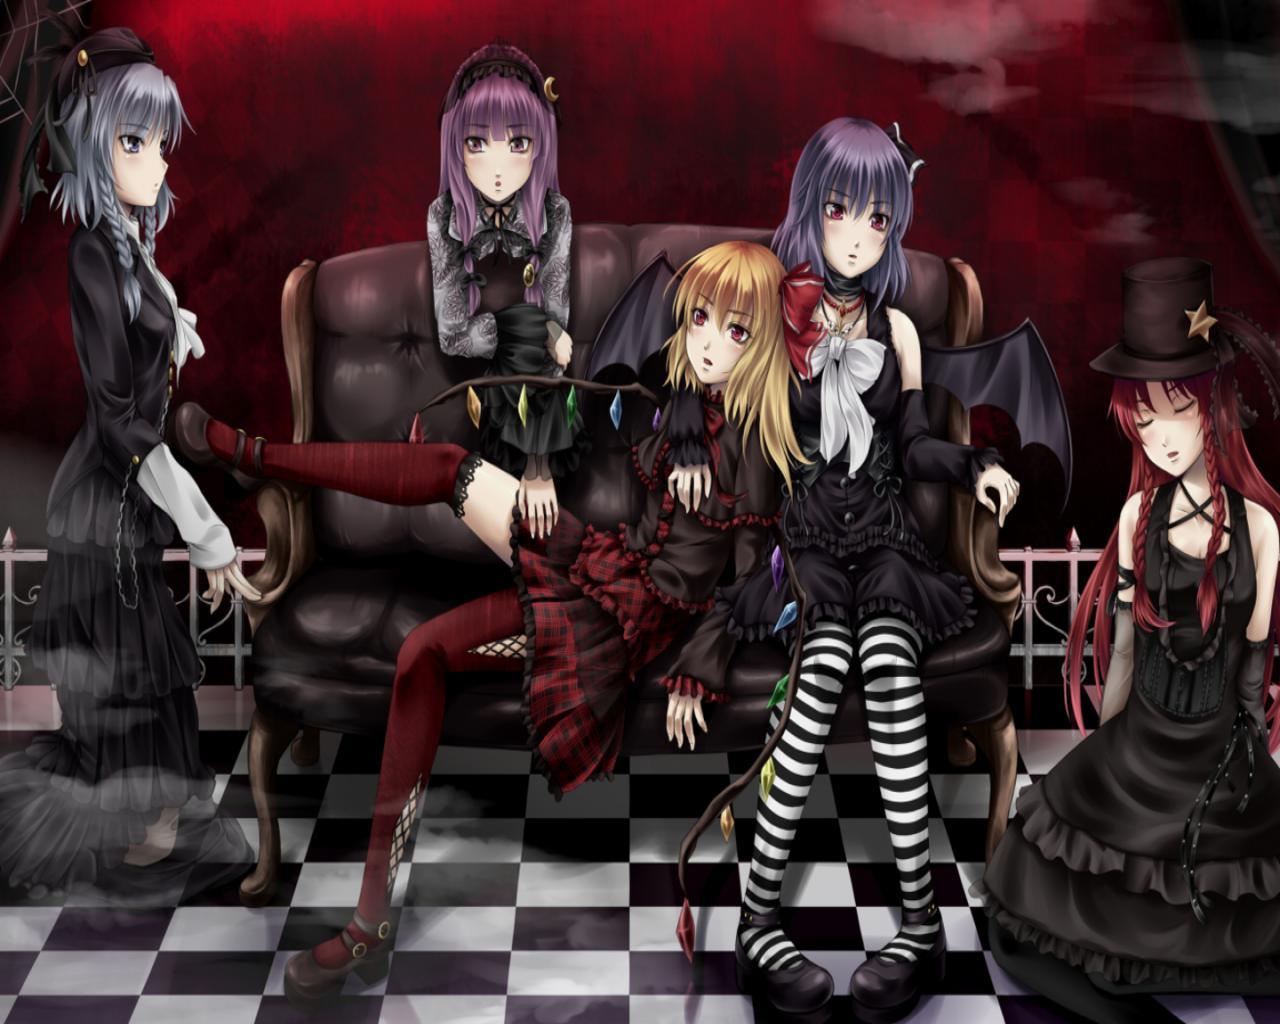 goth anime: